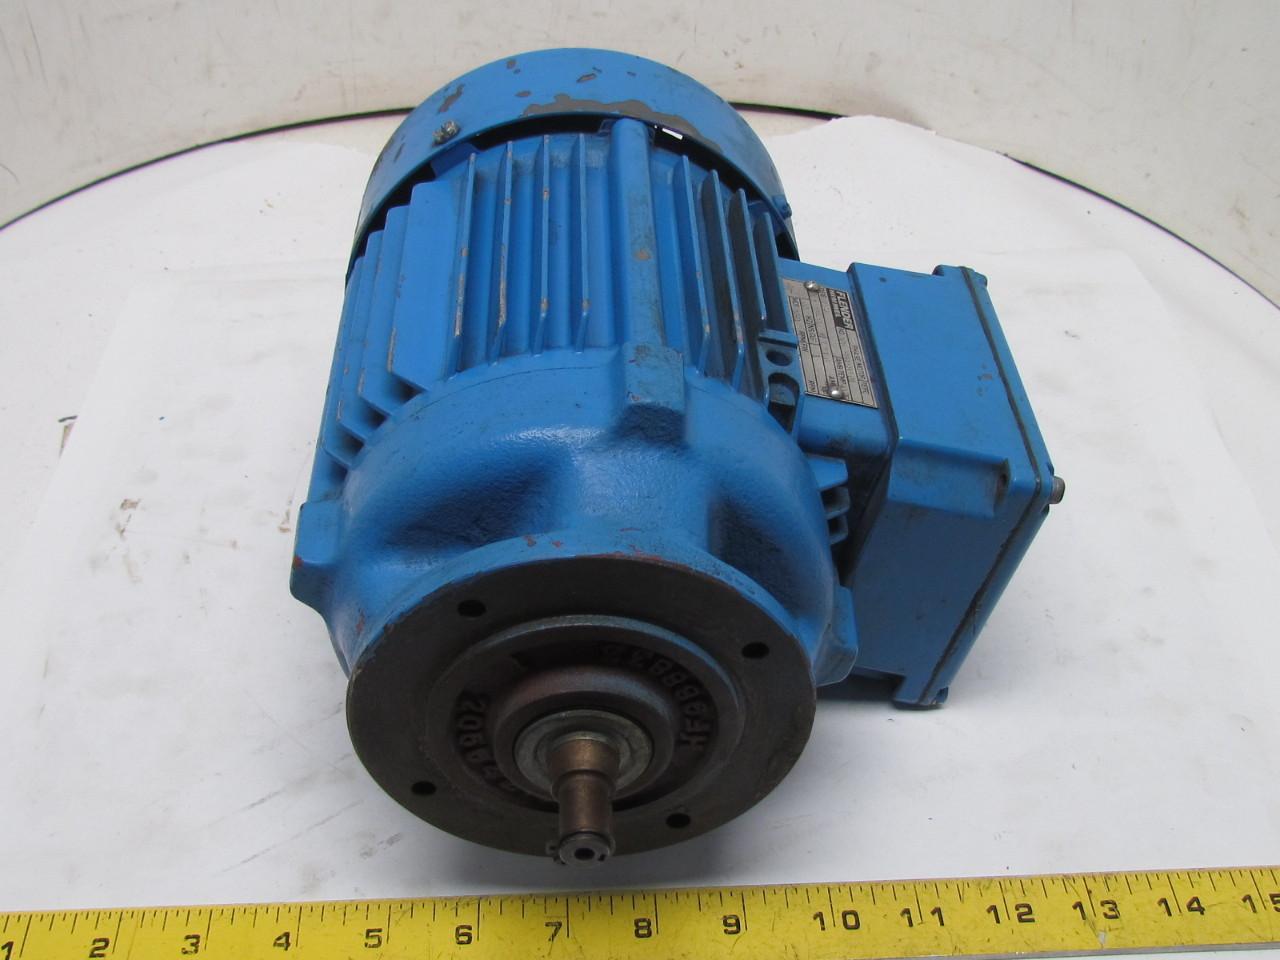 Flender himmel m2c4 3 phase ac motor 1hp 1690 rpm 208 230 for Flender himmel motors usa